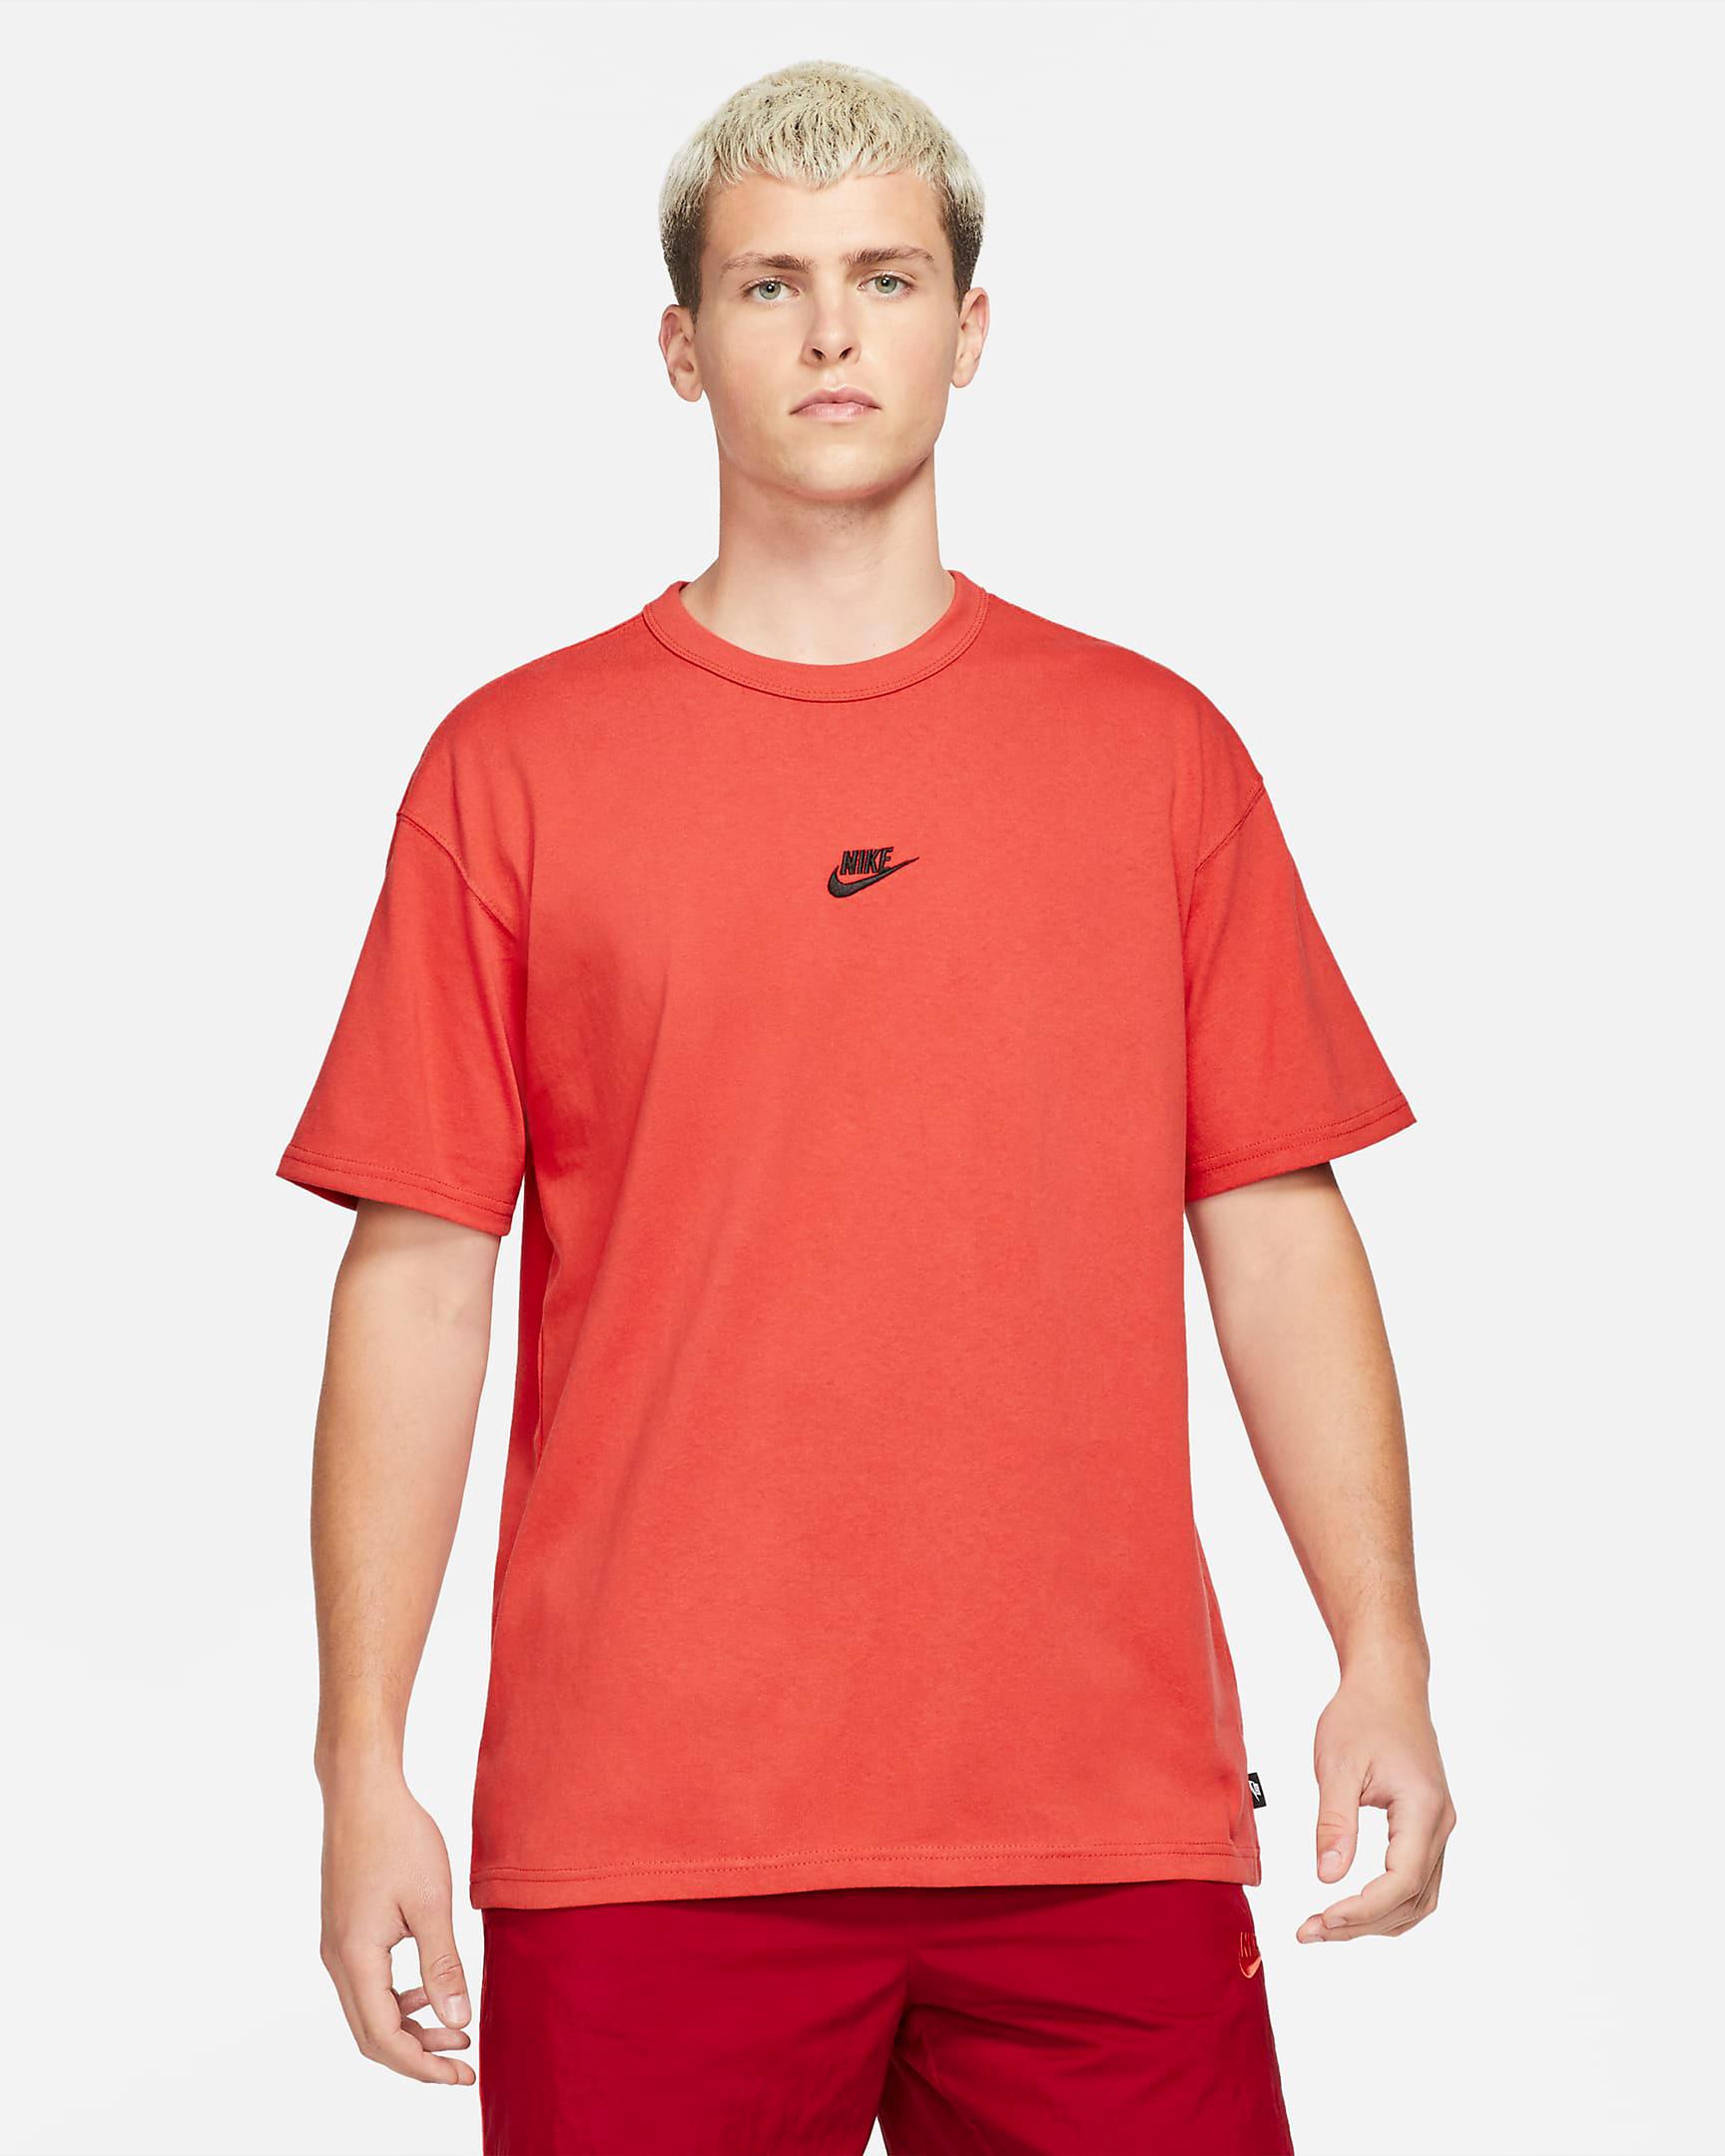 nike-lobster-premium-essential-t-shirt